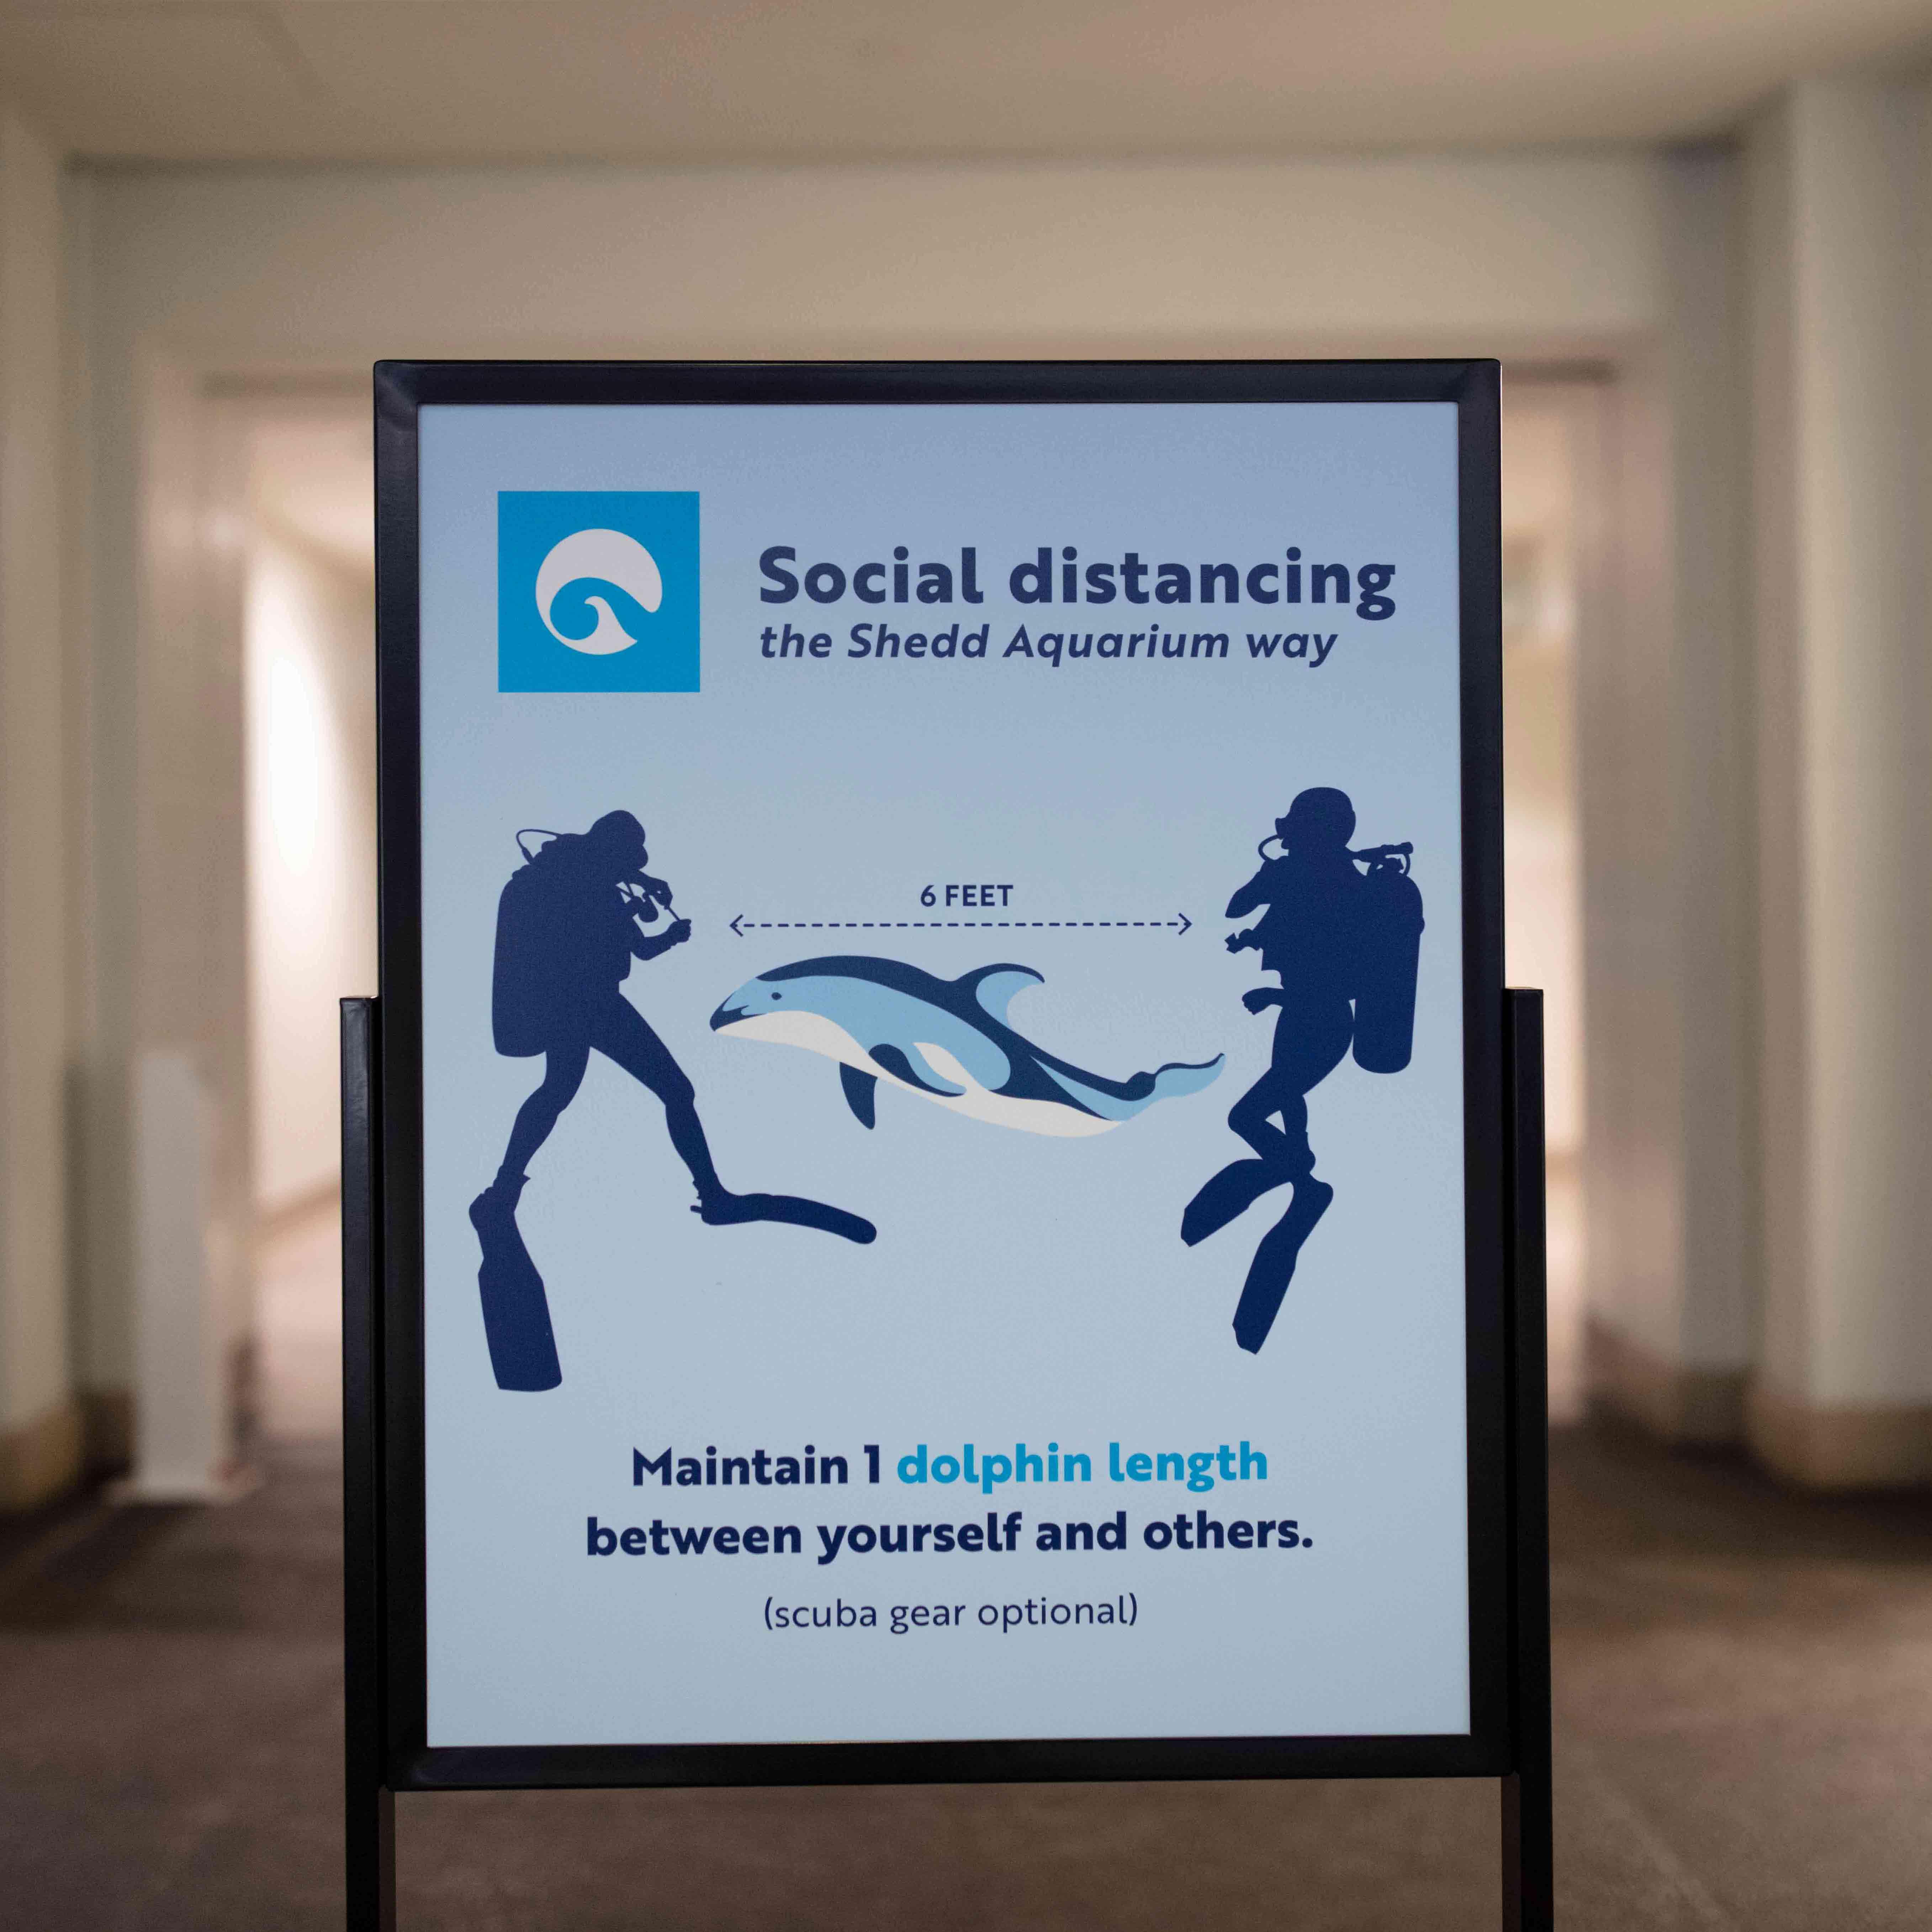 Shedd Aquarium's distance signage